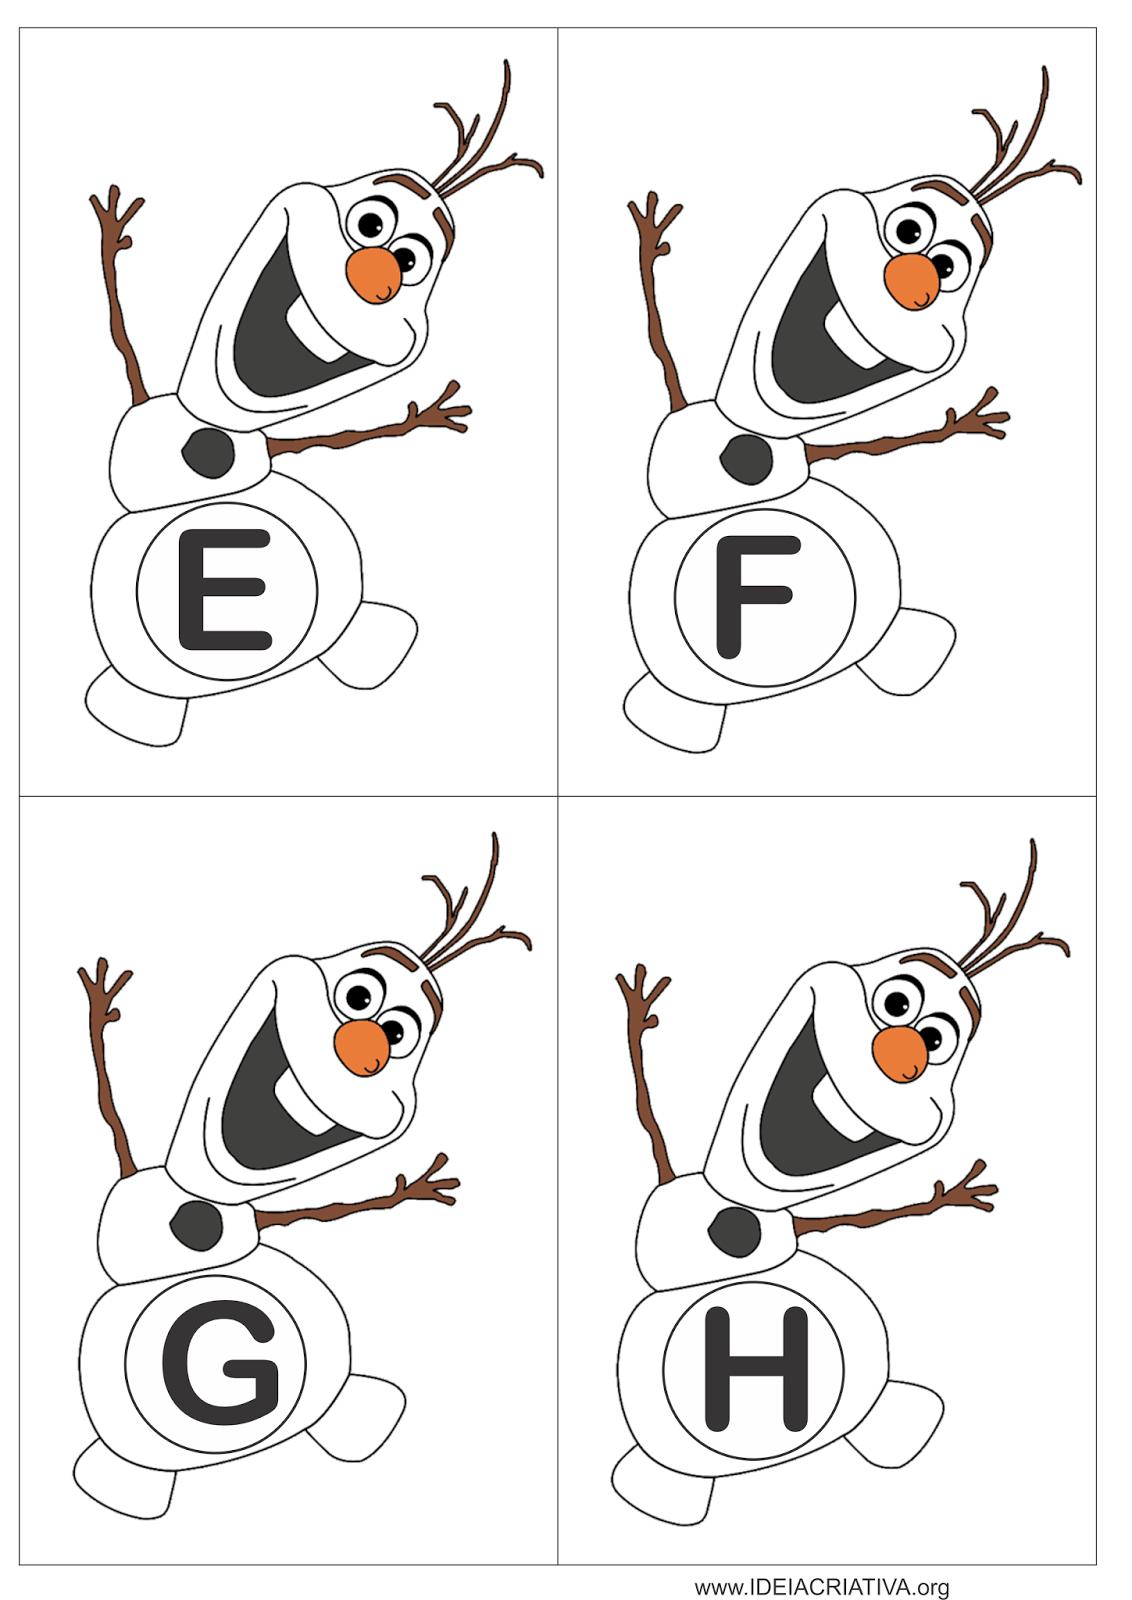 Alfabeto Olaf Frozen para jogo pedagógico